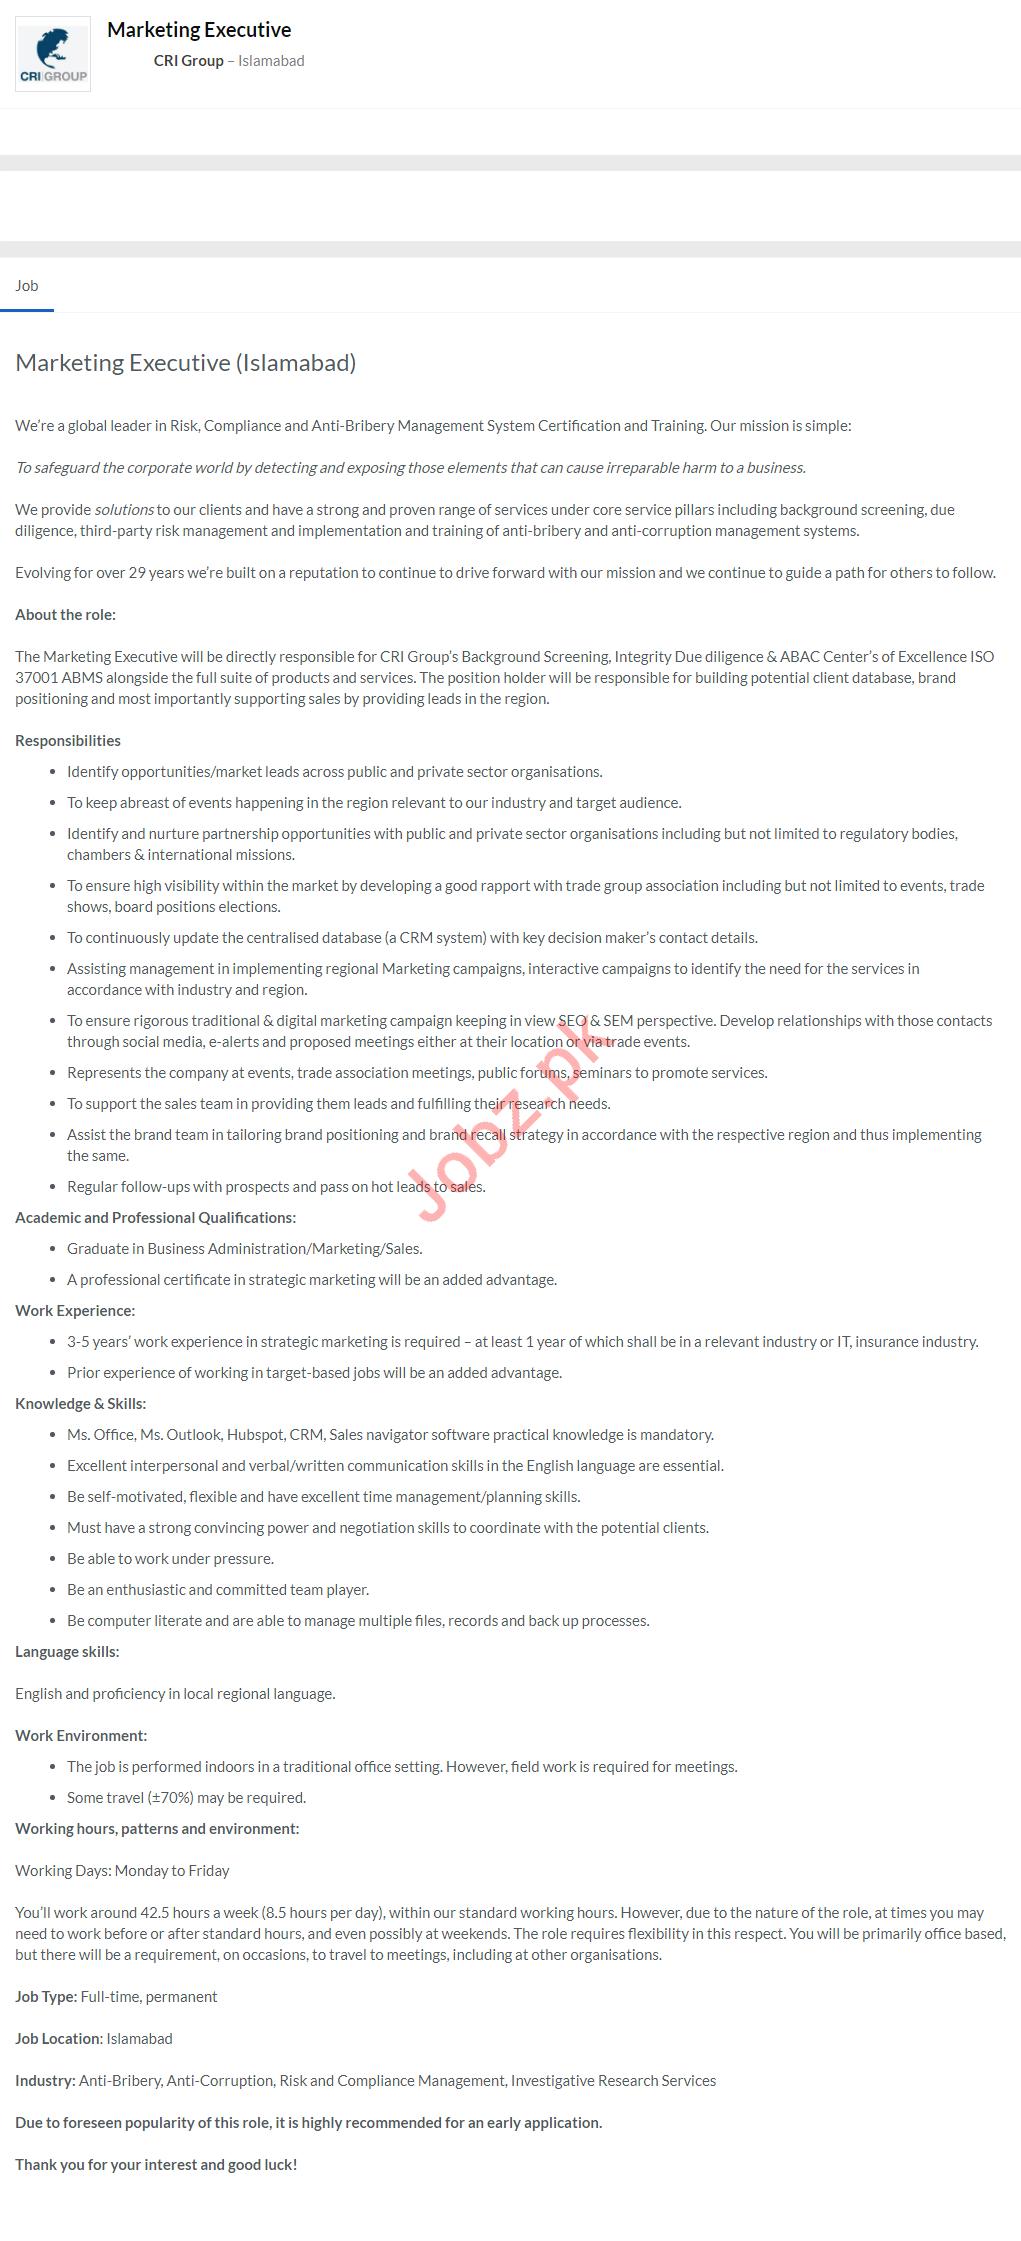 CRI Group Marketing Execurtive Jobs 2020